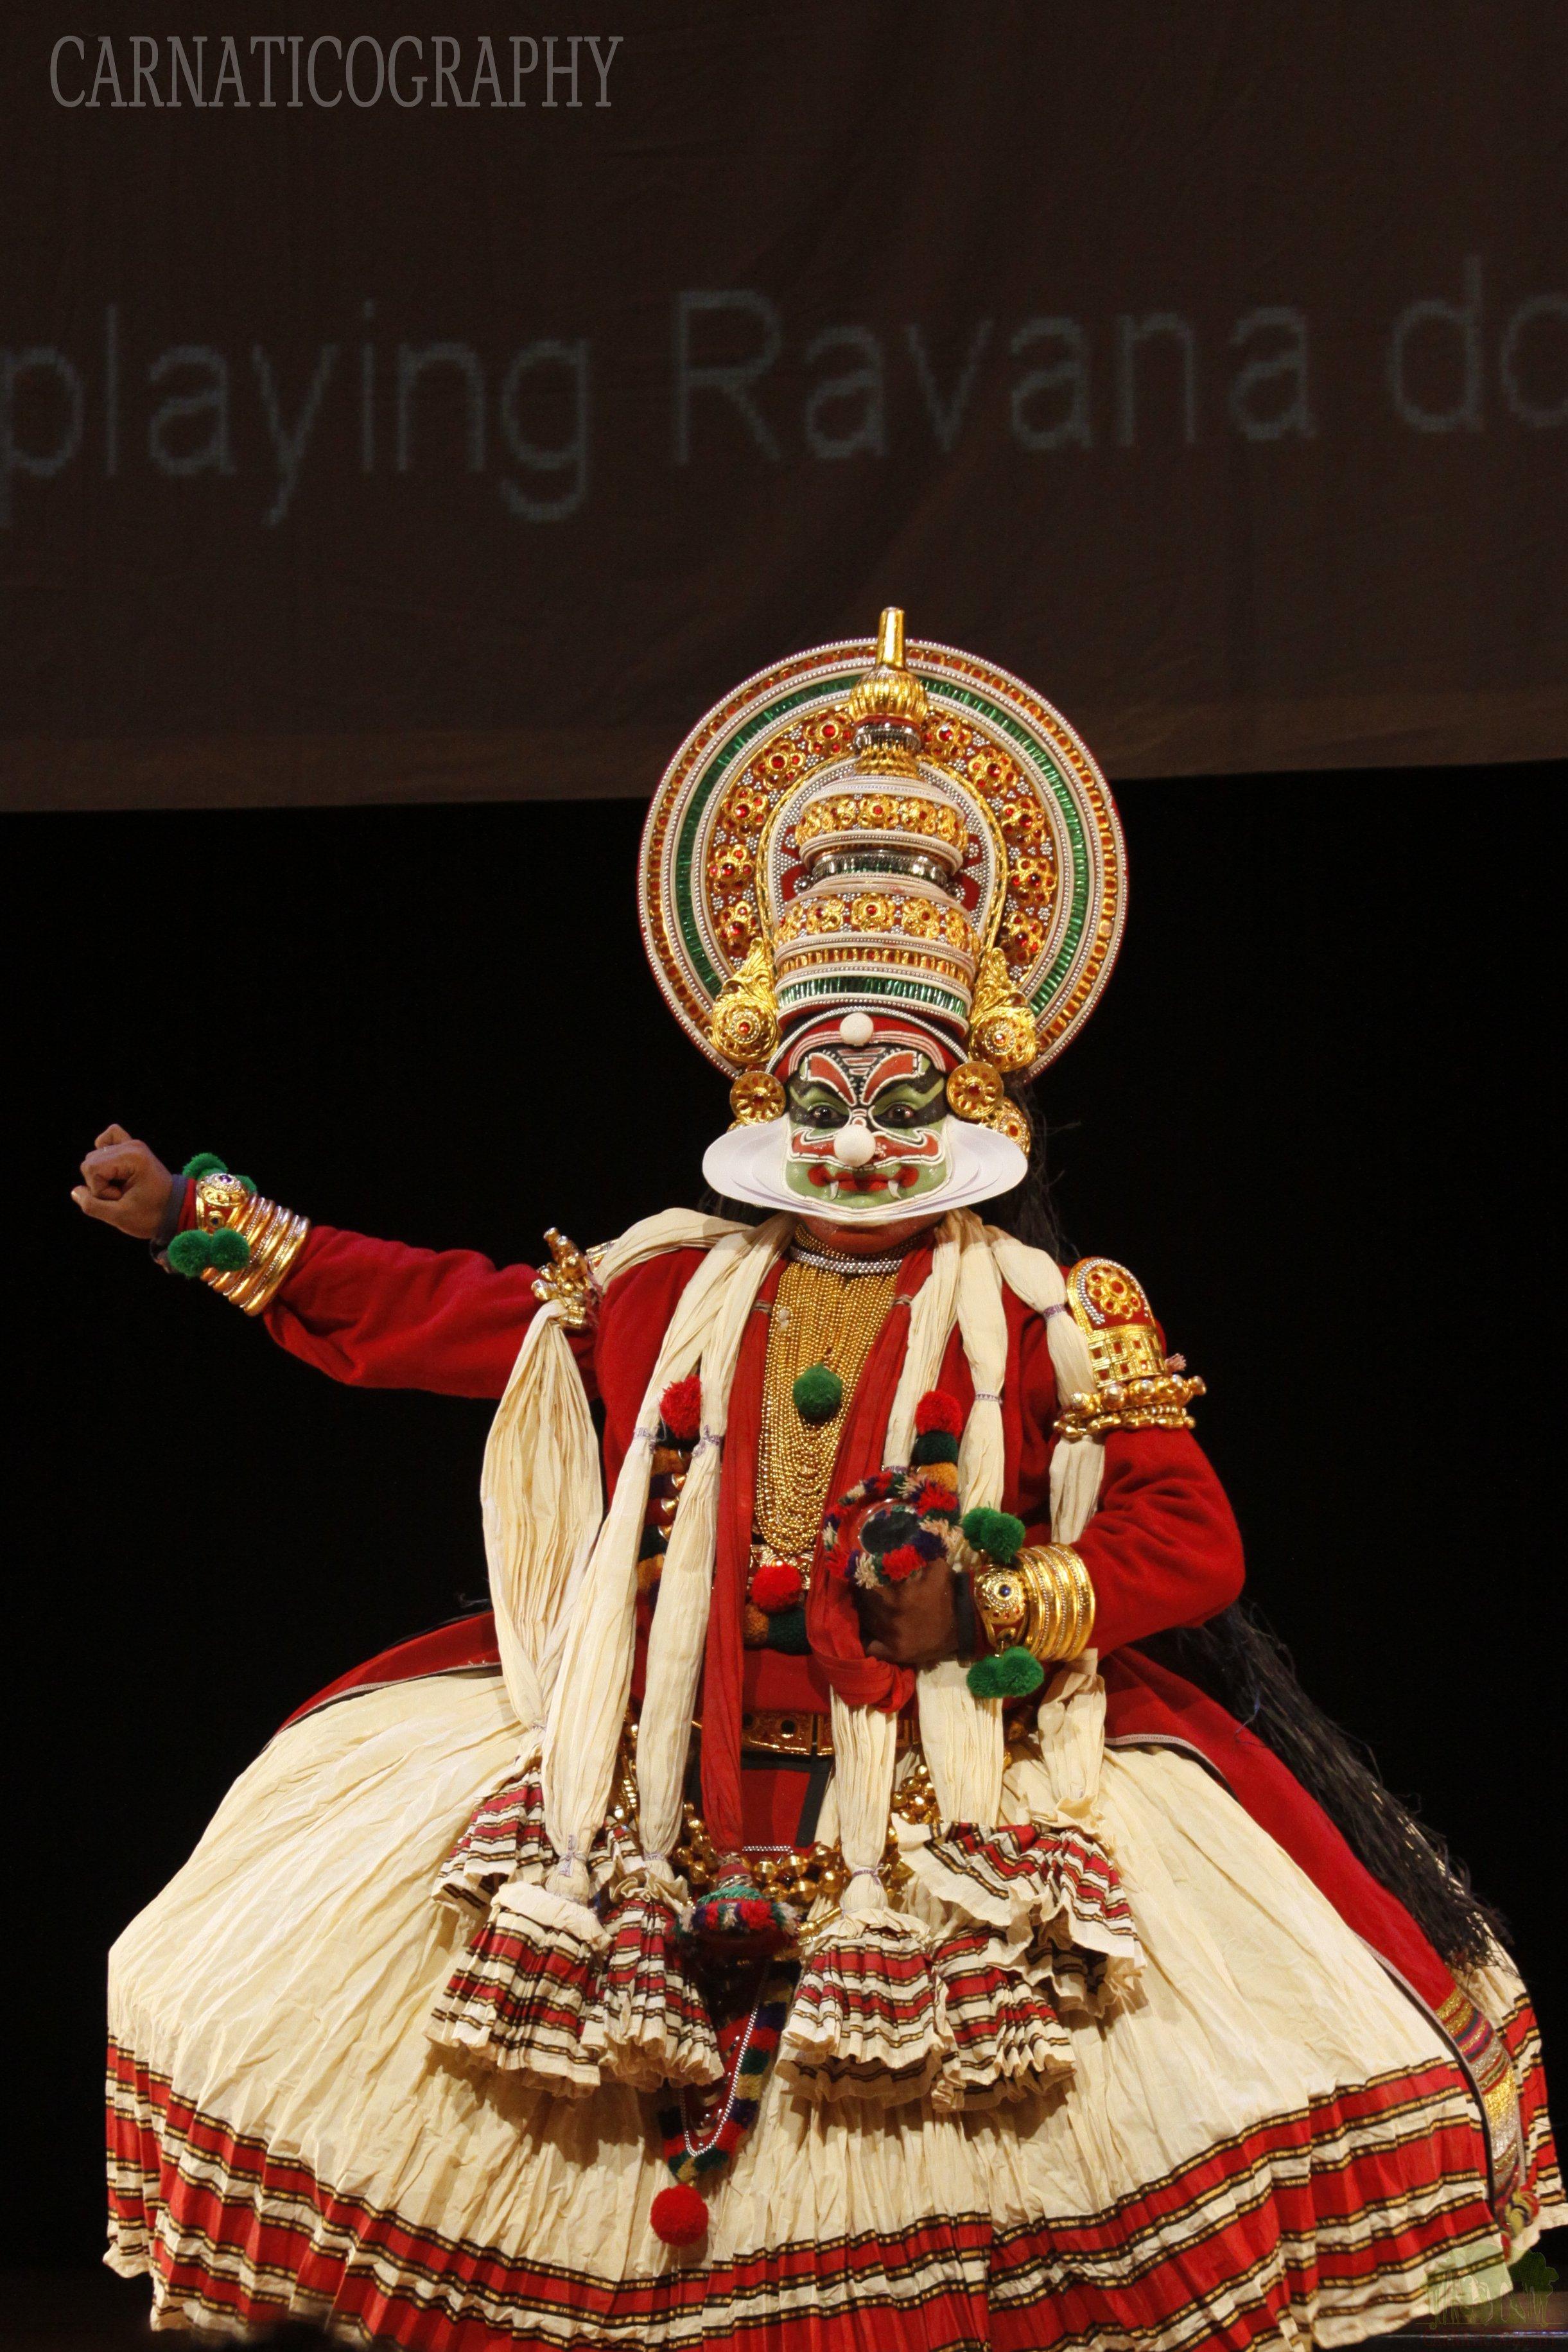 Shanmugam Das as Ravana - Oberlin 2010